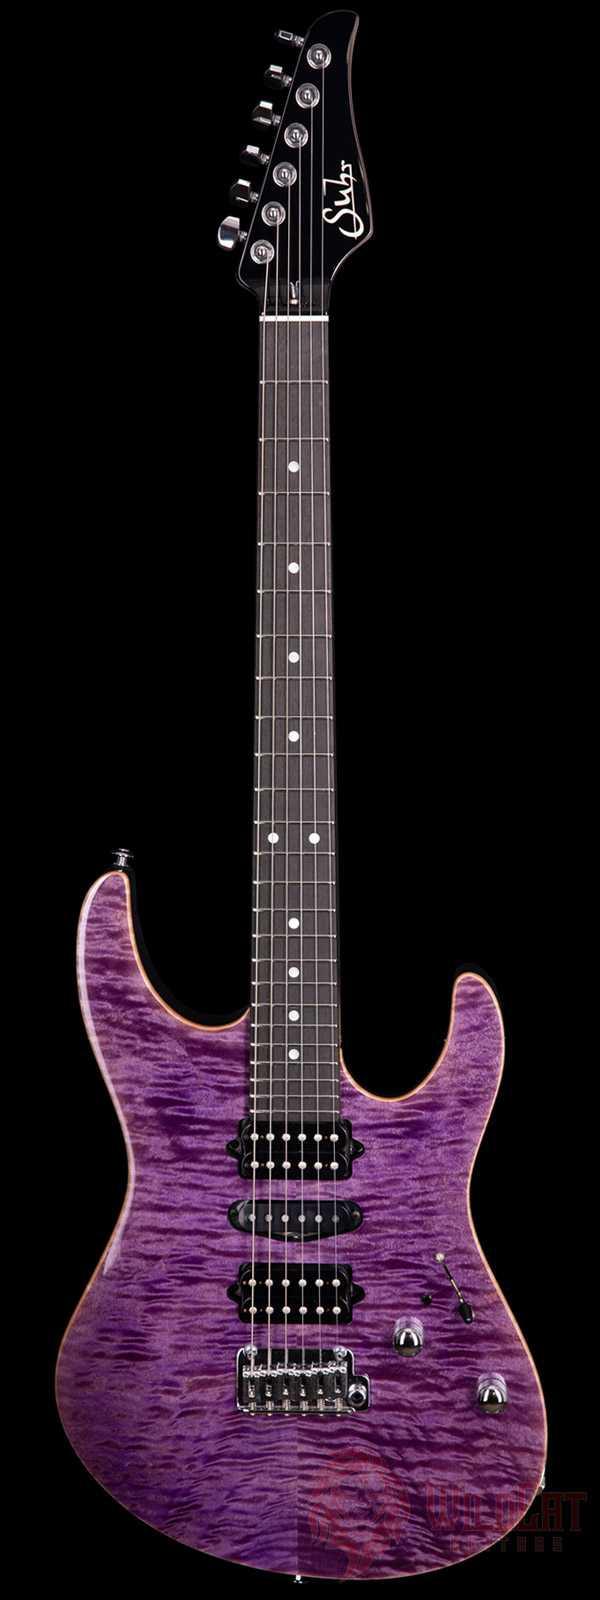 Suhr Custom Modern Trans Purple Roasted Maple Neck